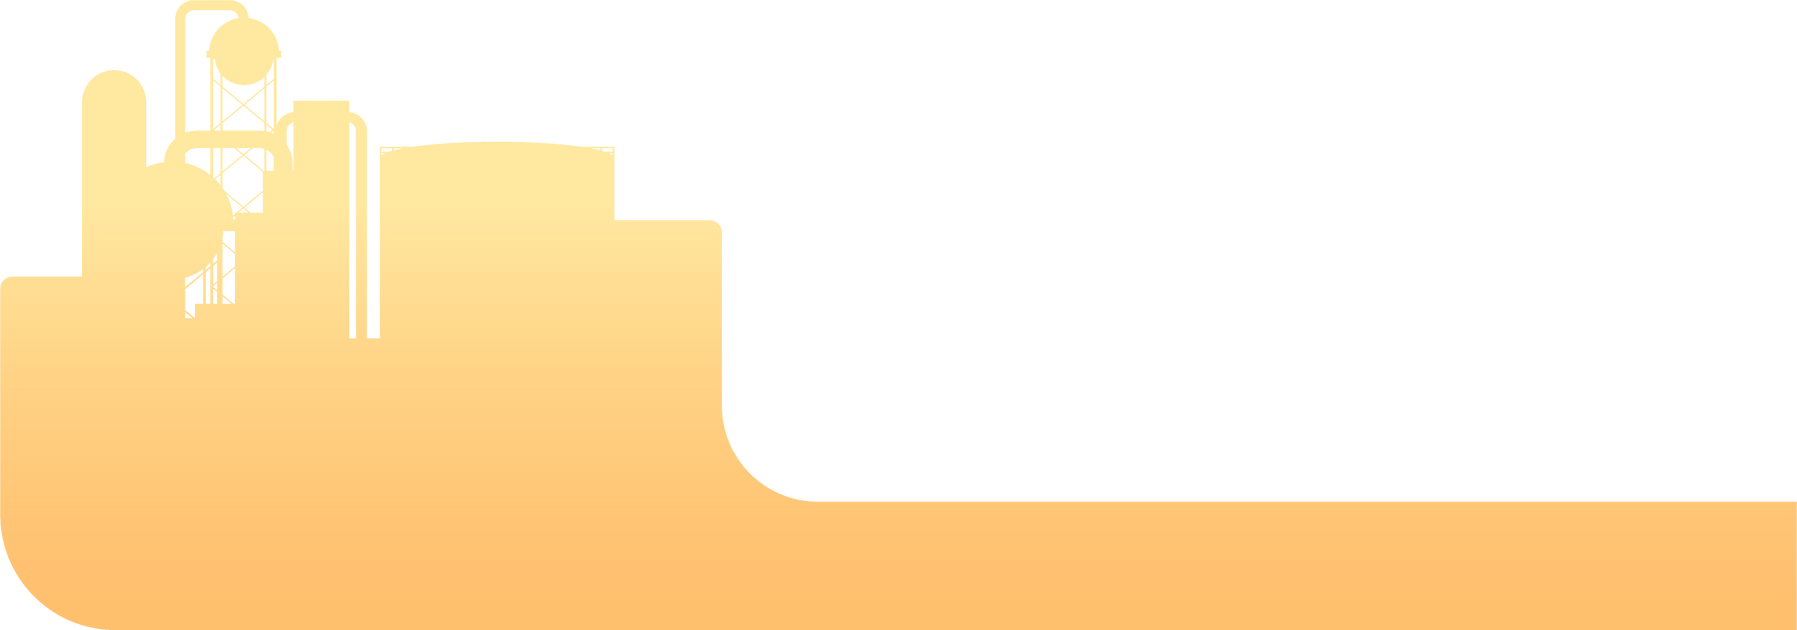 elementos a exportar-69.png